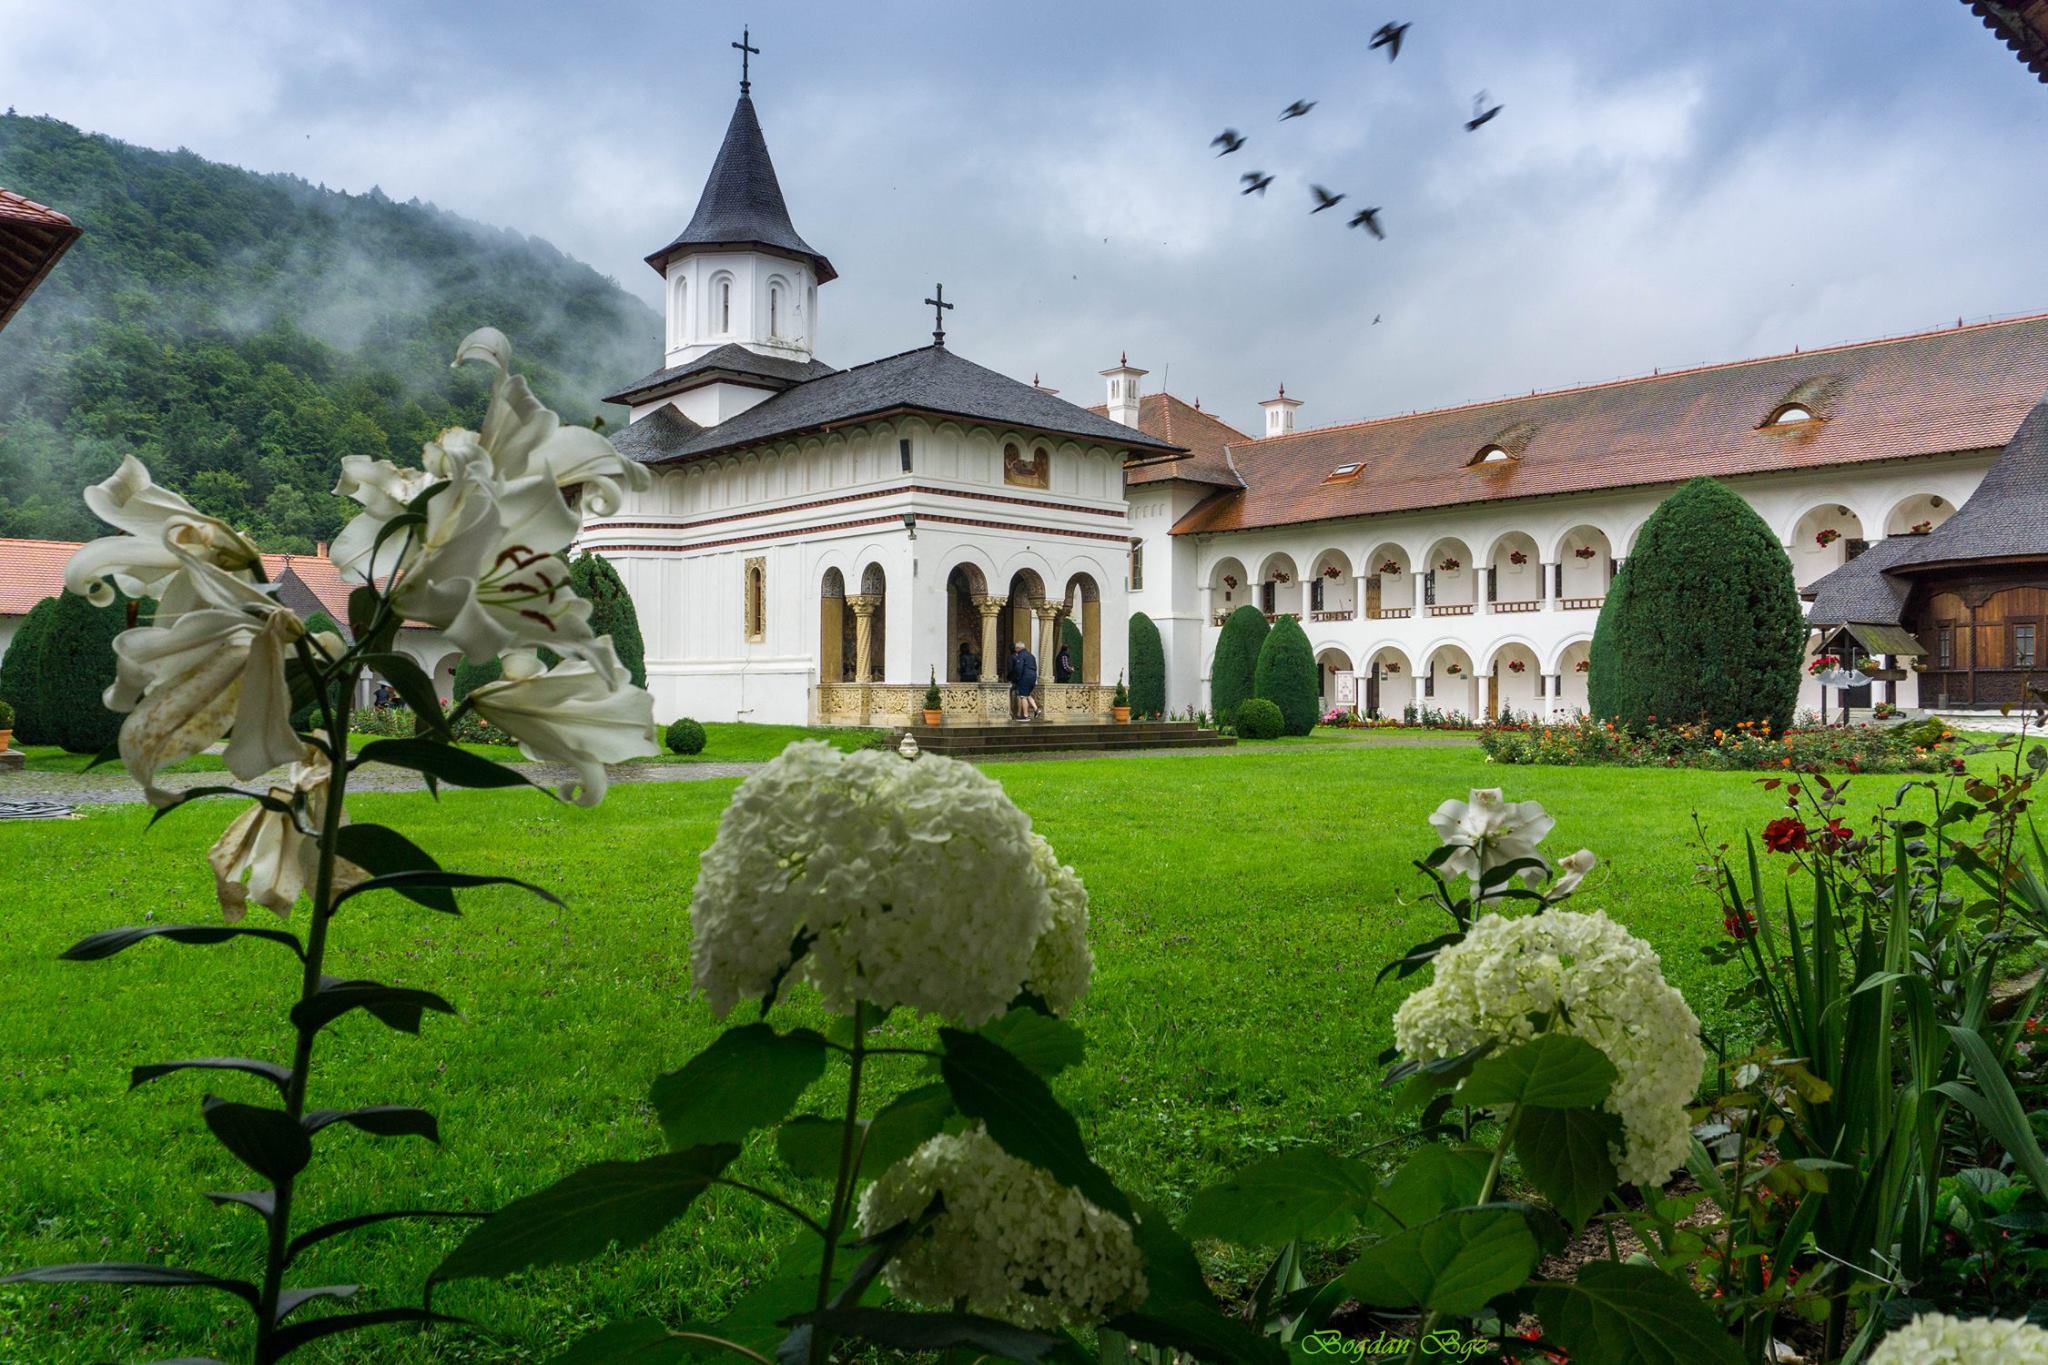 Manastirea Brancoveanu - Bogdan Sarmoiu